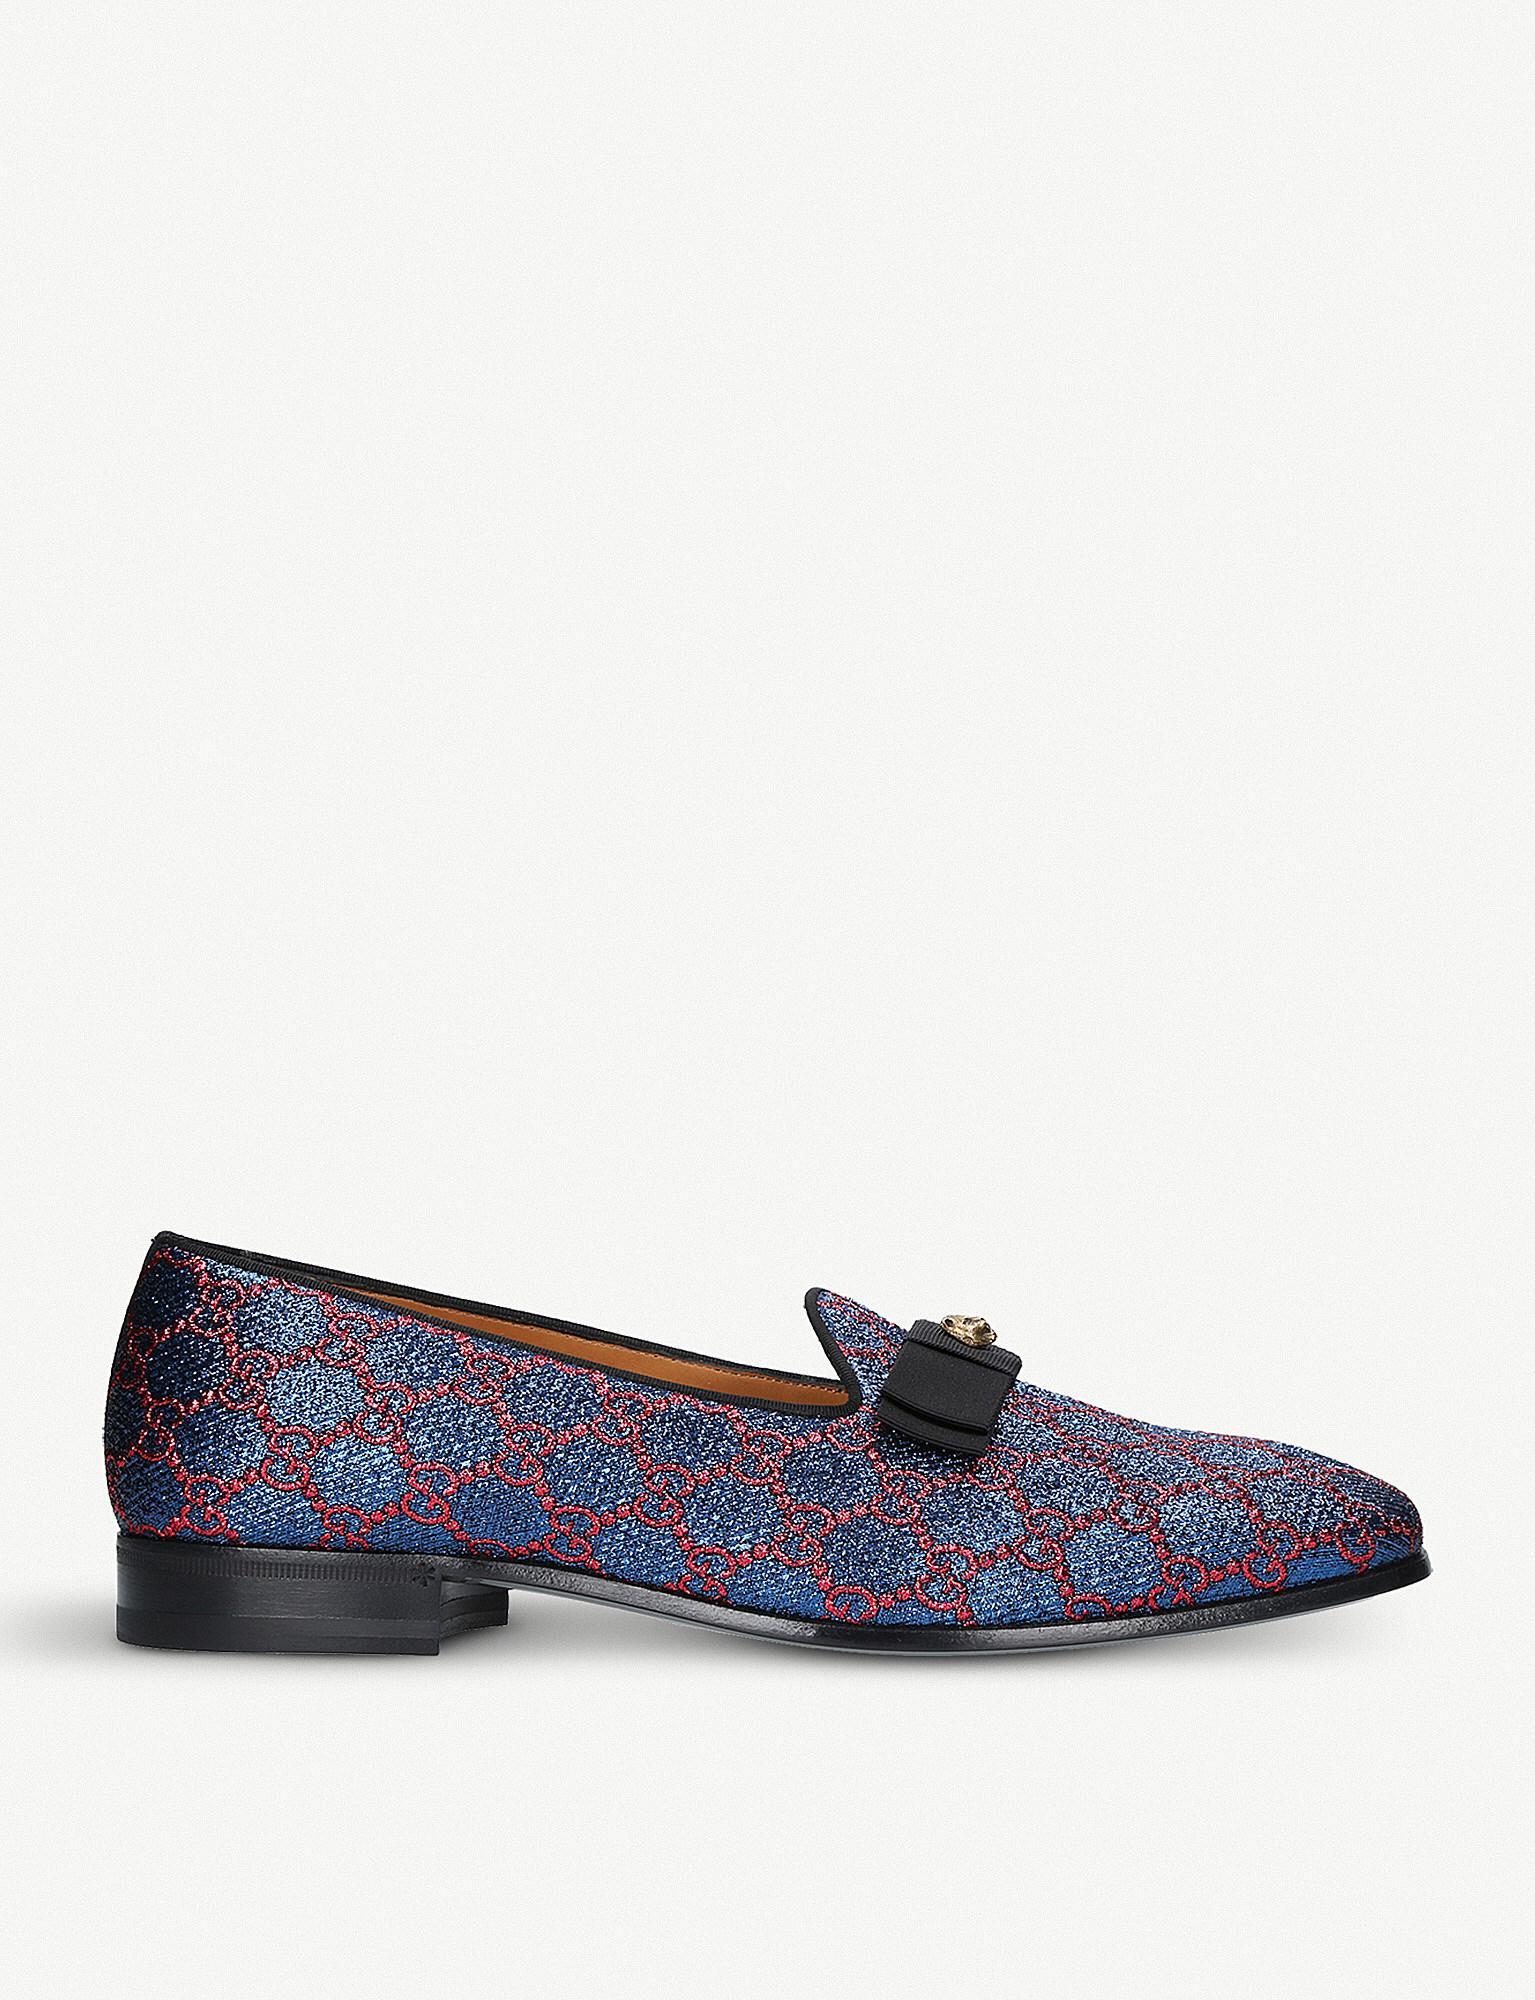 f1584cdba01 Gucci Metallic Jacquard Gg Loafers in Blue - Lyst